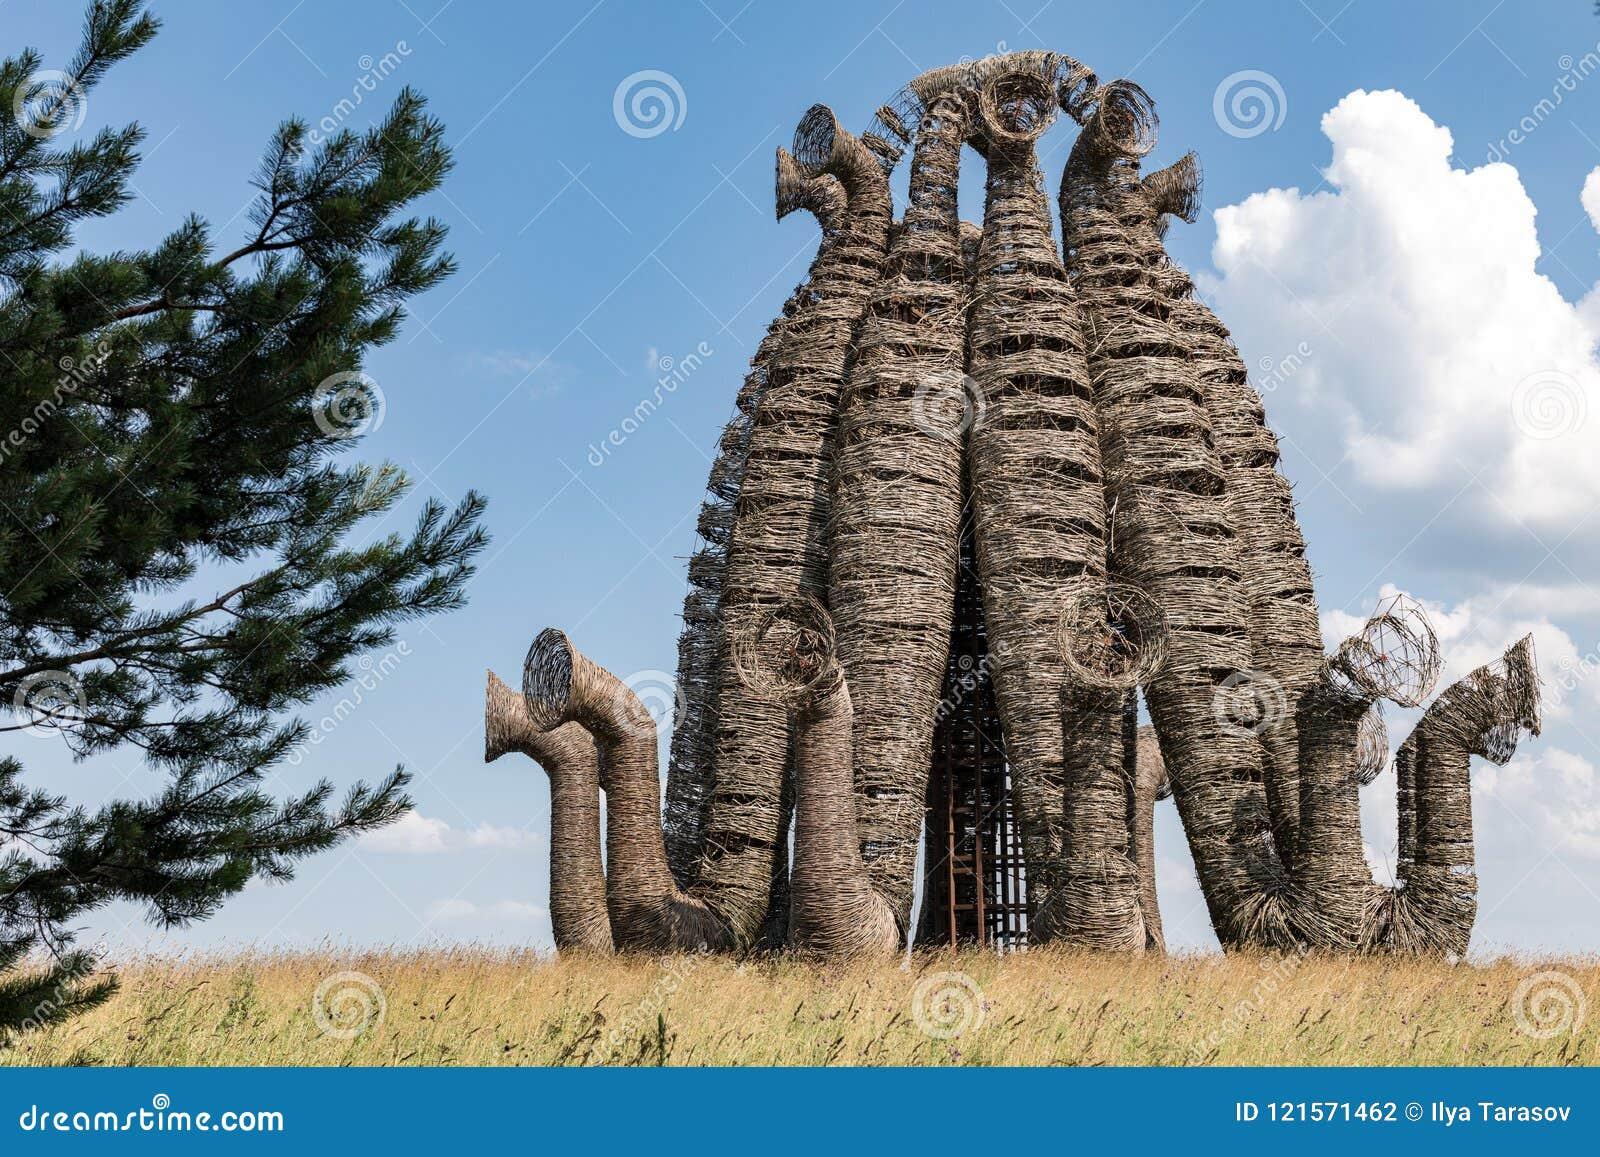 Que suis-je Martine 16/02 - bravo Ajonc Russia-nikola-lenivets-july-wooden-sculpture-bobur-art-park-national-kaluga-region-festival-landscape-objects-121571462